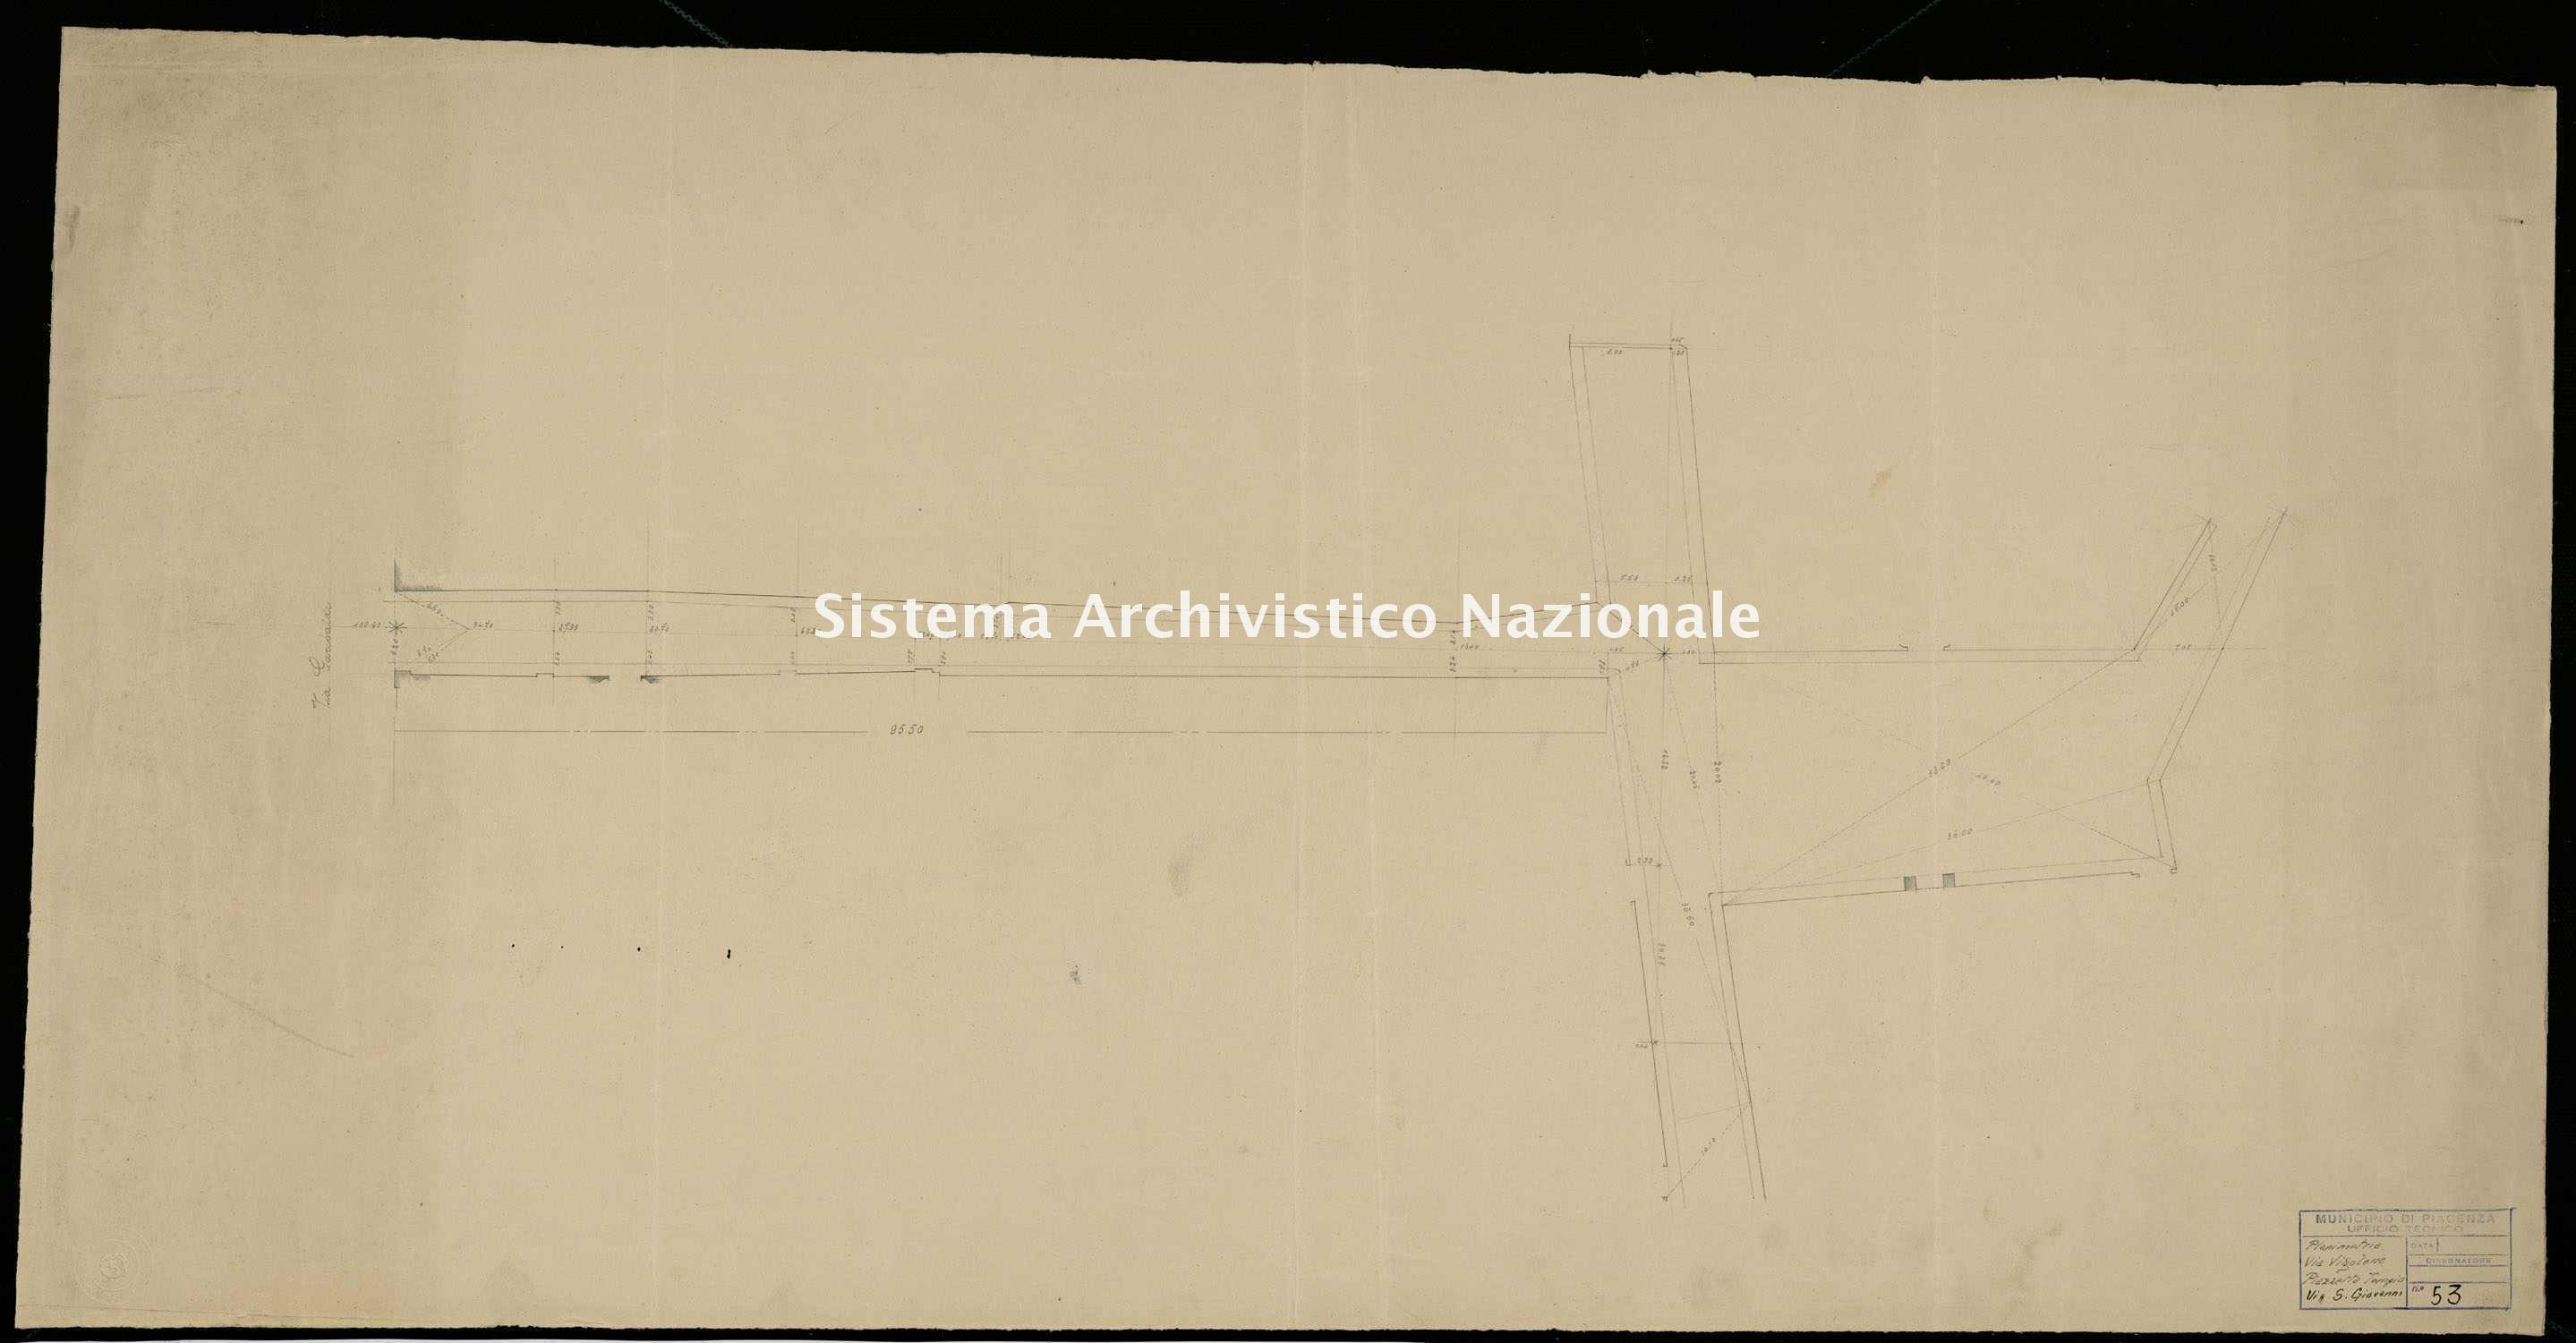 ASPC Mappe, stampe e disegni, n. 5126